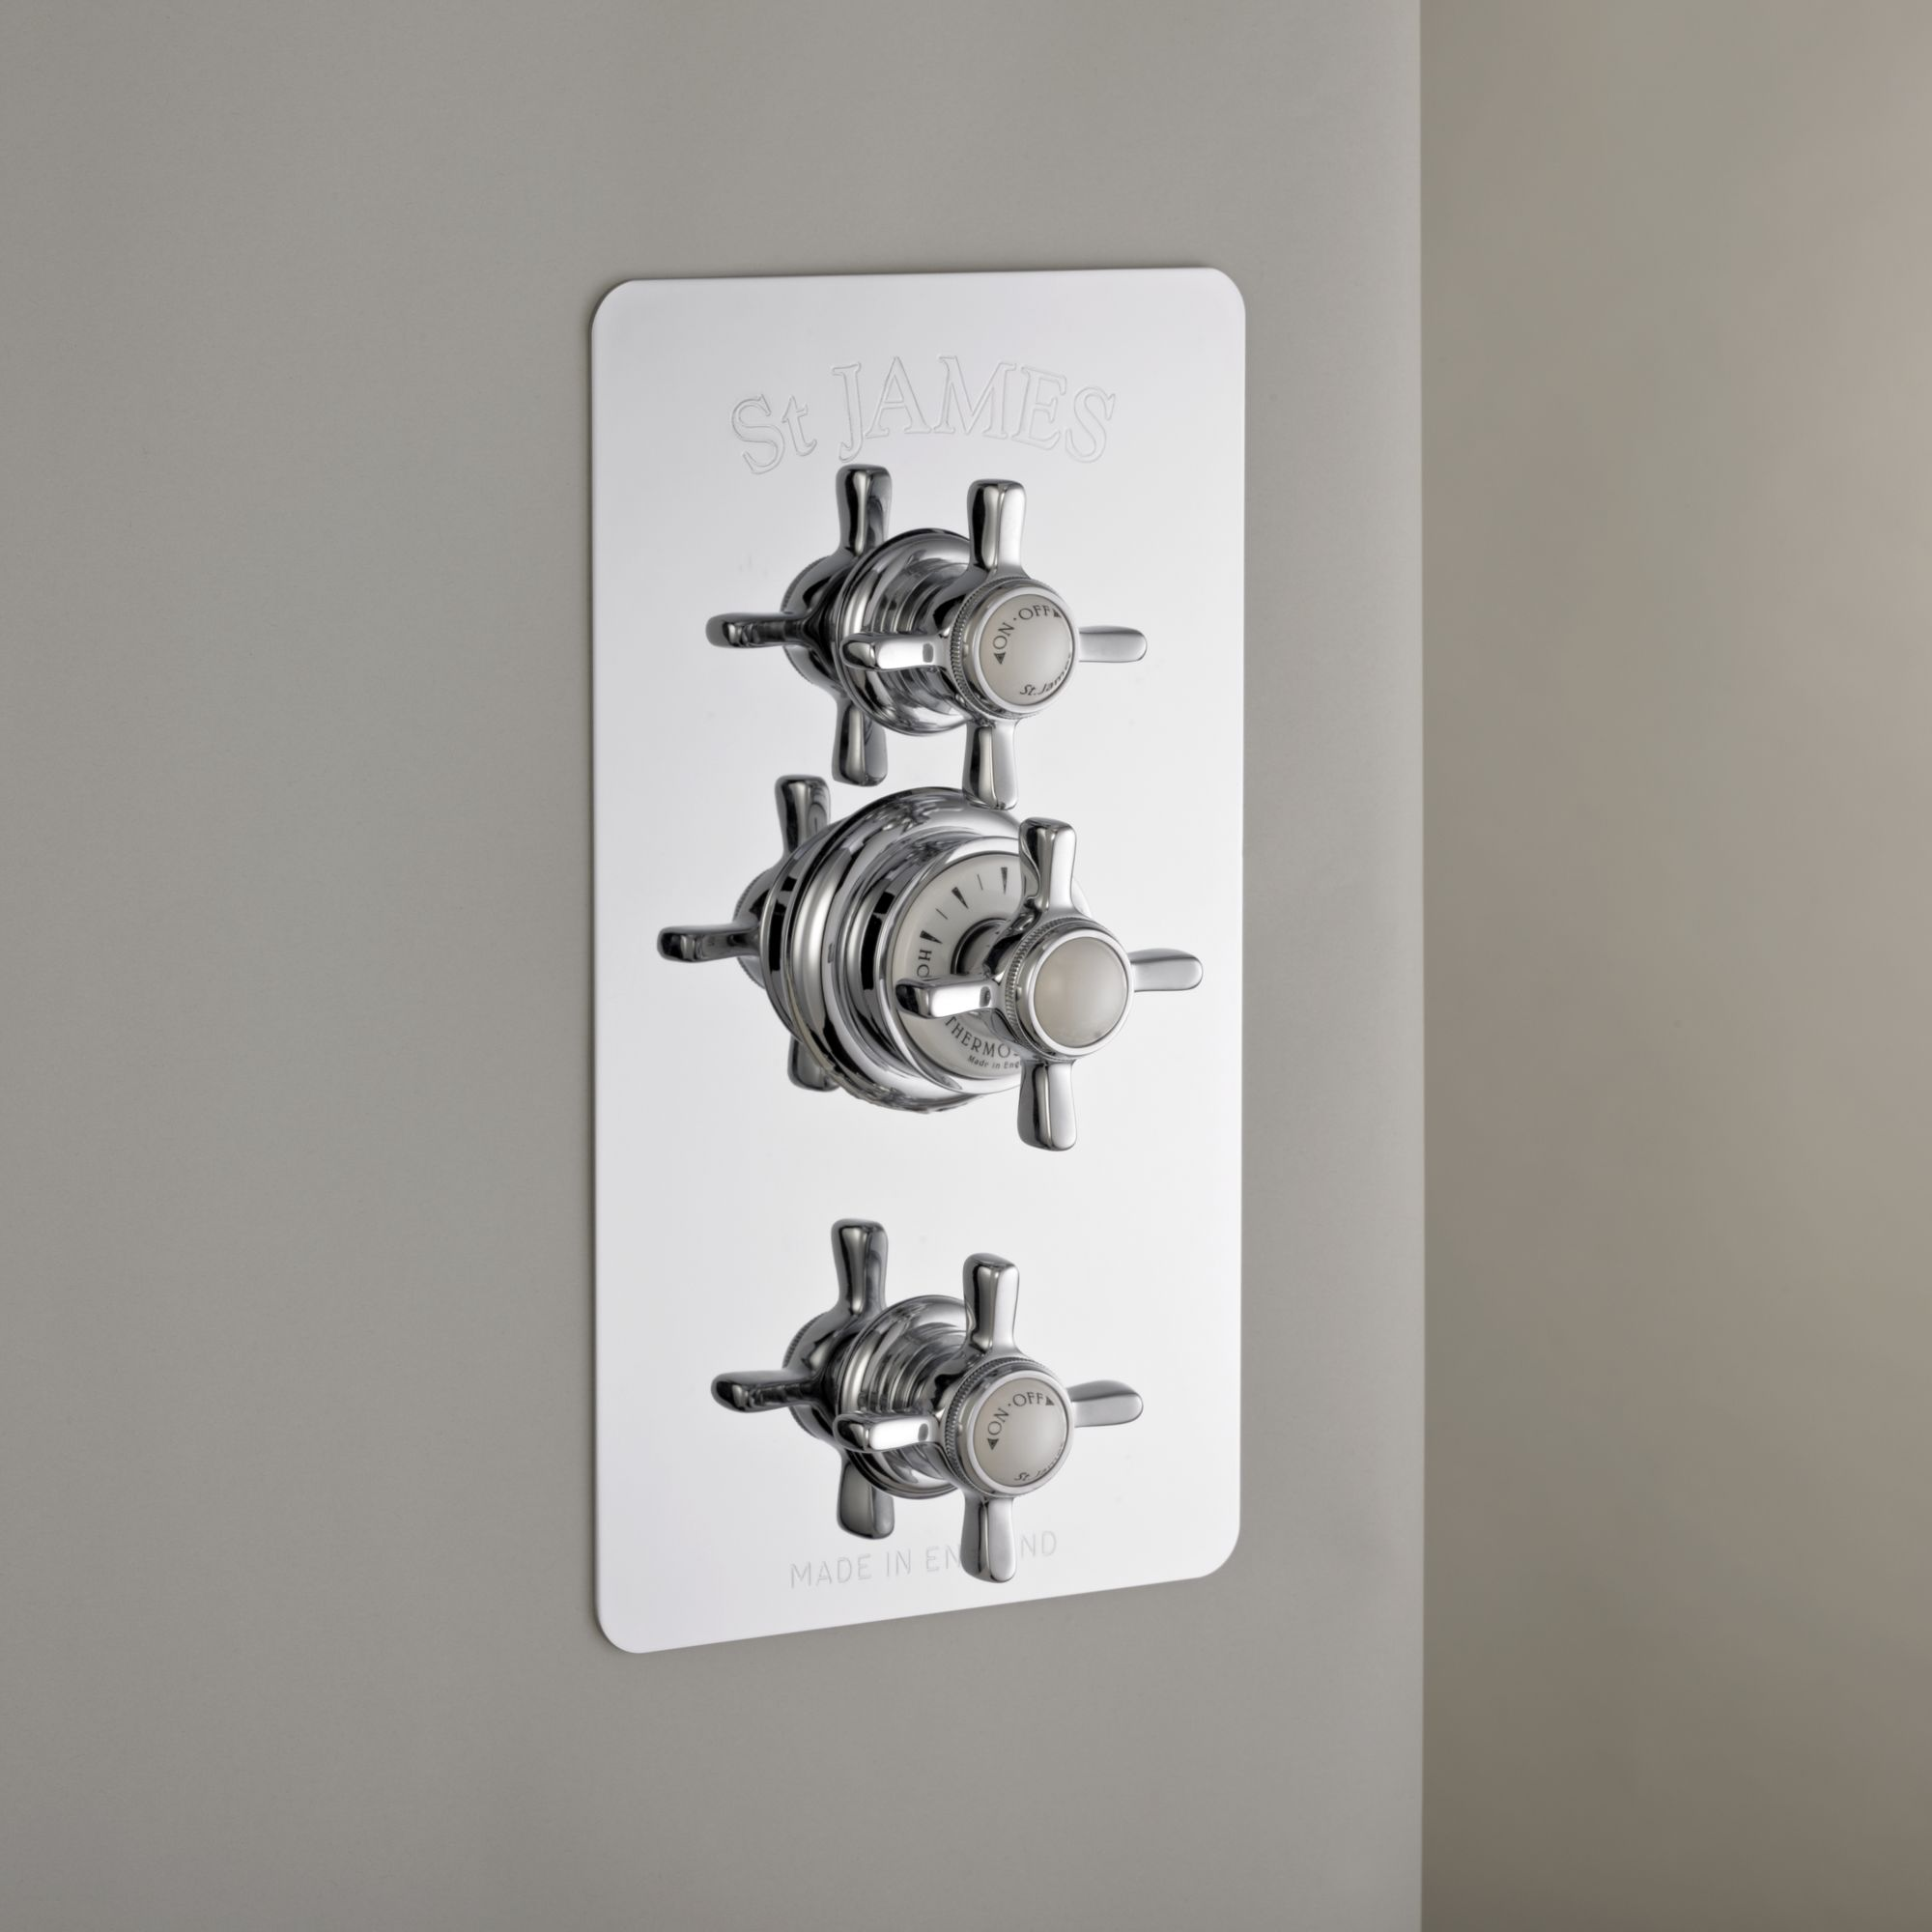 thermostat duscharmatur mit abdeckplatte traditional bathrooms. Black Bedroom Furniture Sets. Home Design Ideas